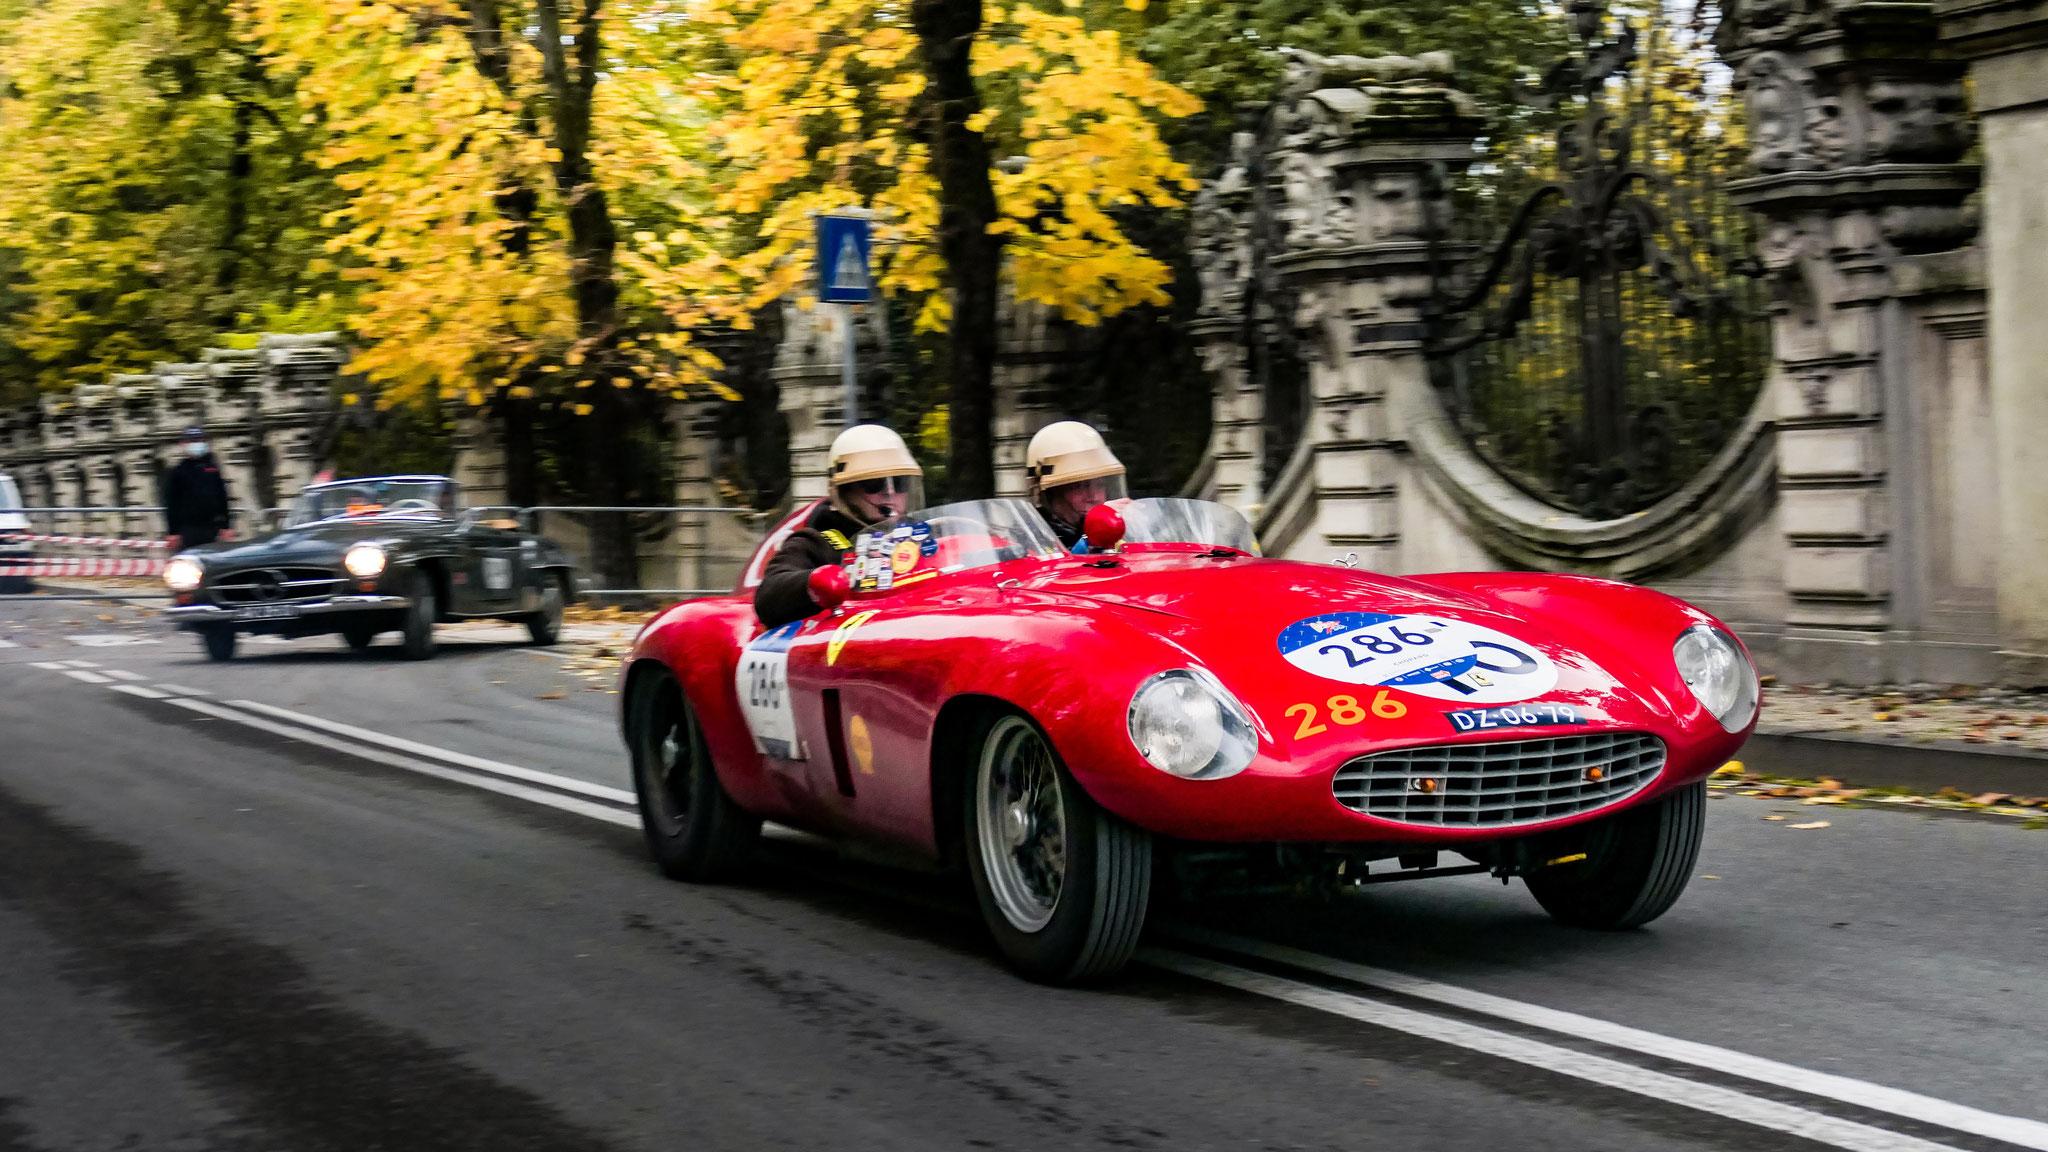 Ferrari 750 Monza Spider Scaglietti - DZ-06-79 (NL)